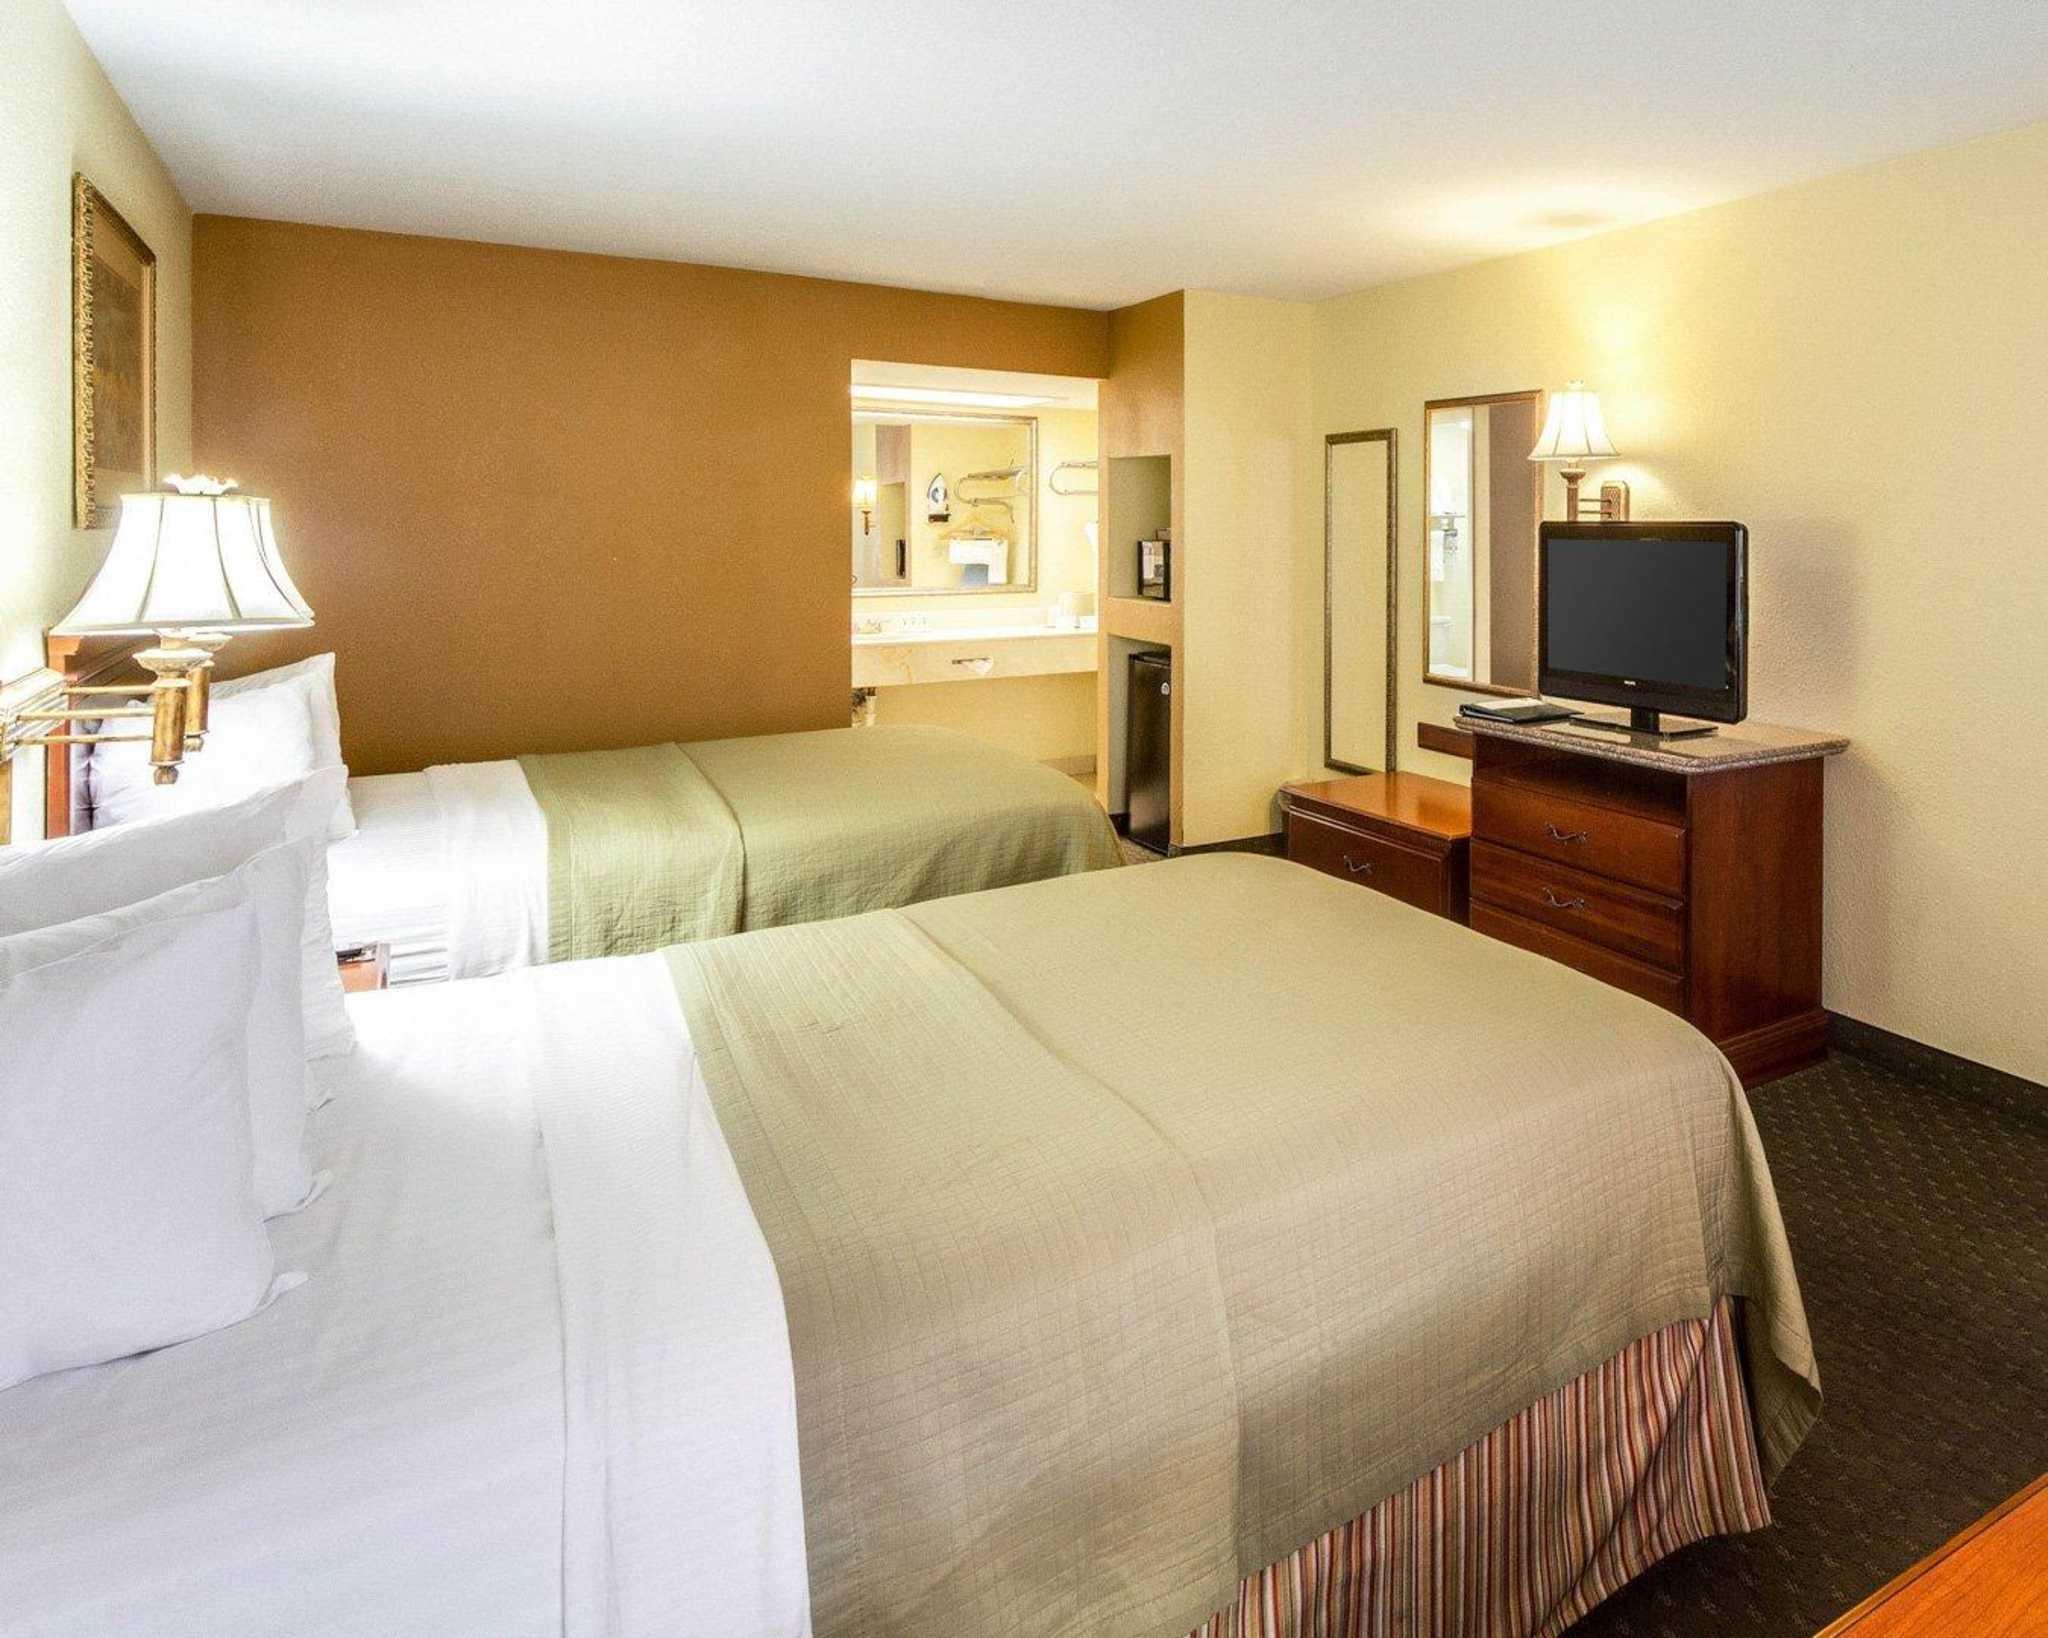 Quality Inn & Suites Eagle Pass image 4